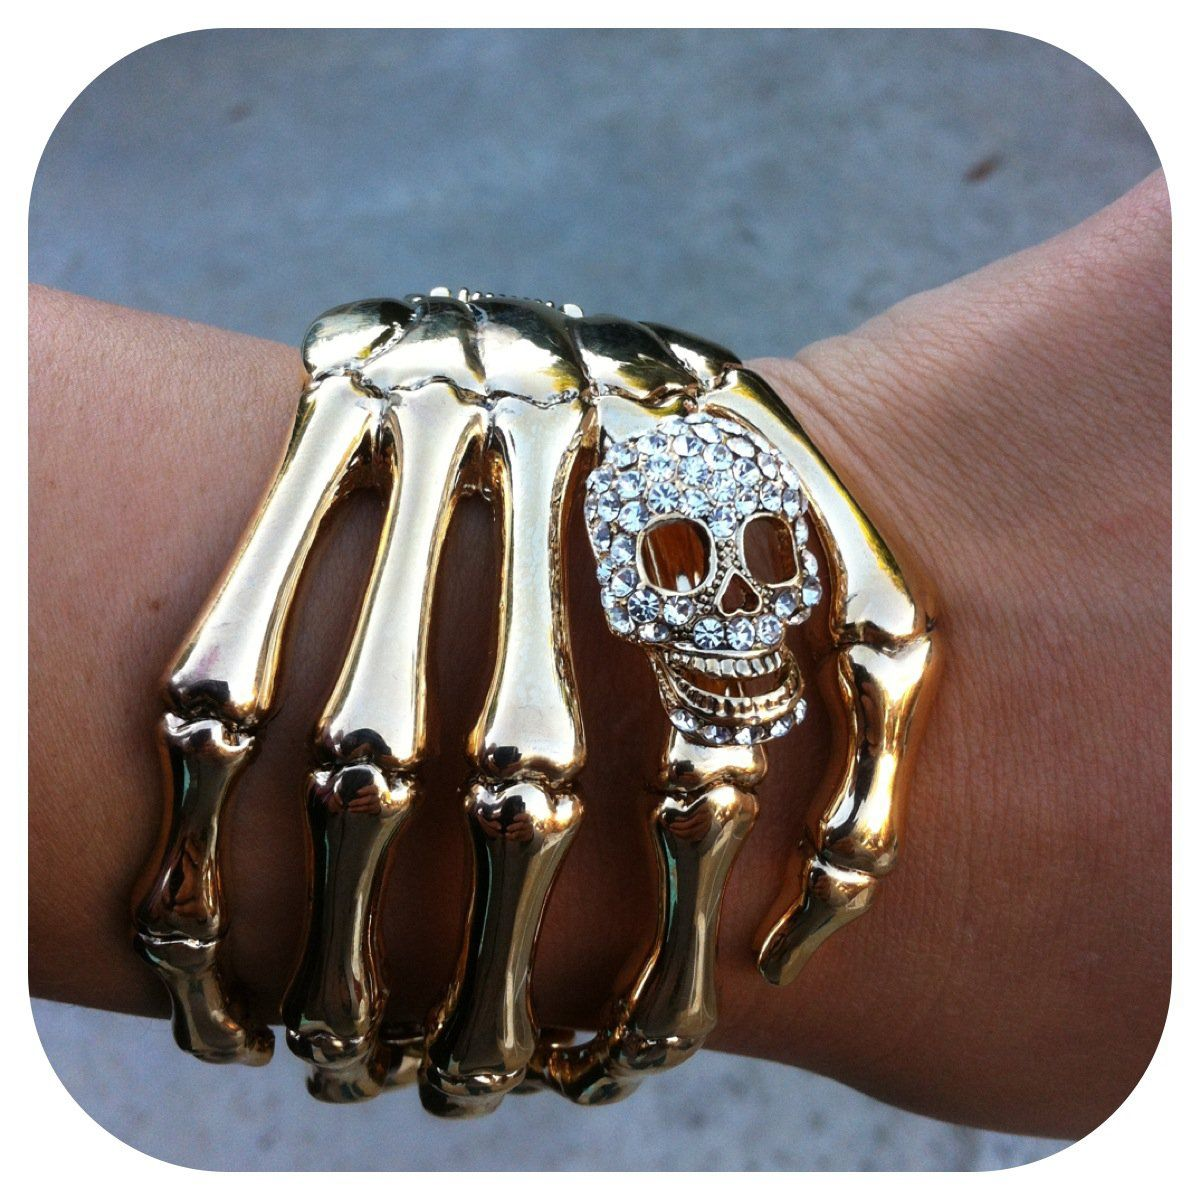 Skull Hand Cuff Gold Joyería de calavera, Accesorios de